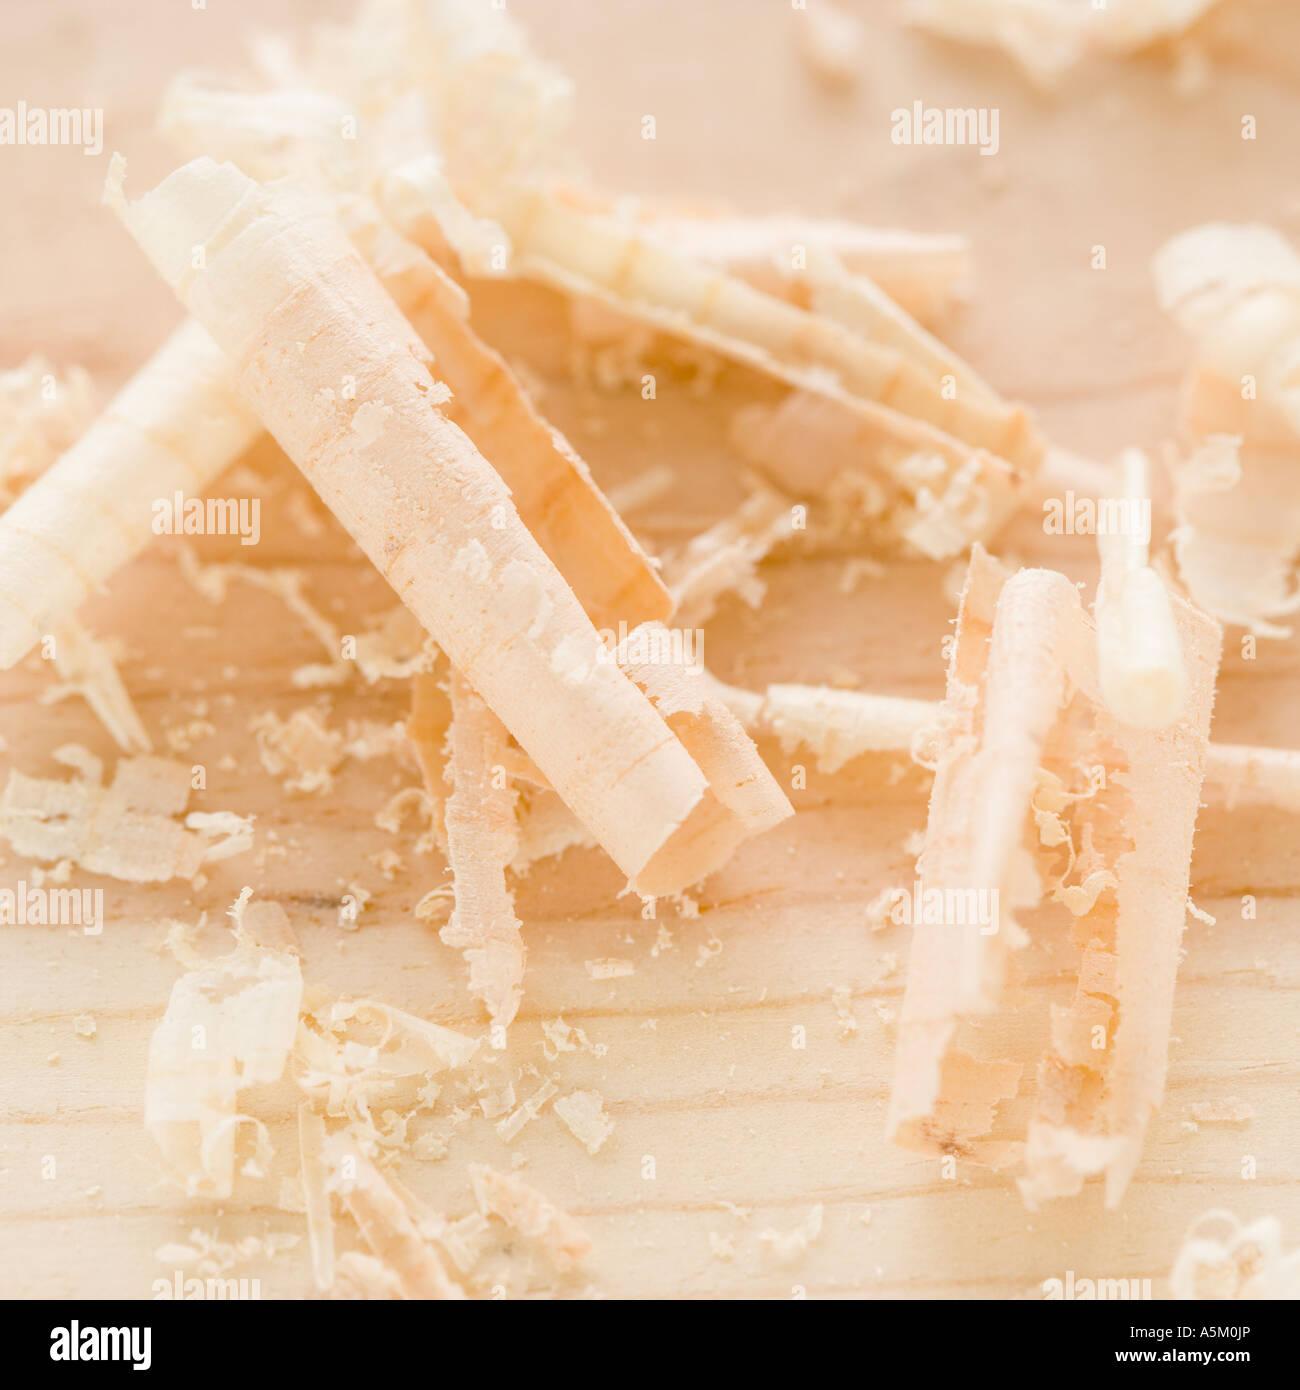 Cerca de virutas de madera Imagen De Stock